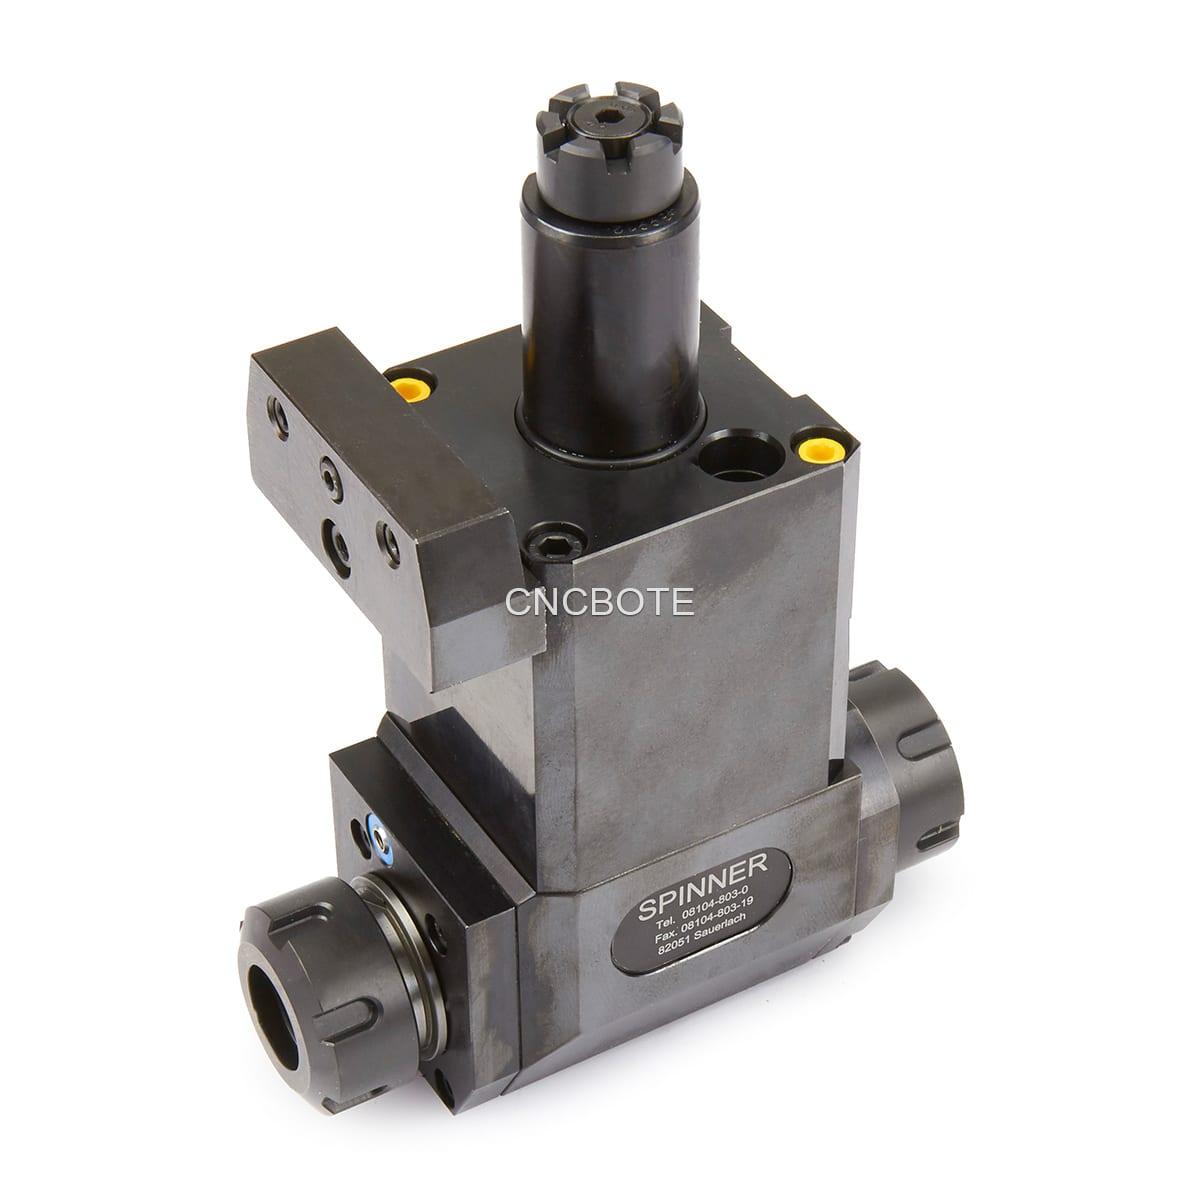 heimatec / Spinner VDI 30 angetriebenes Werkzeug radial doppelseitig, ER25, Baruffaldi